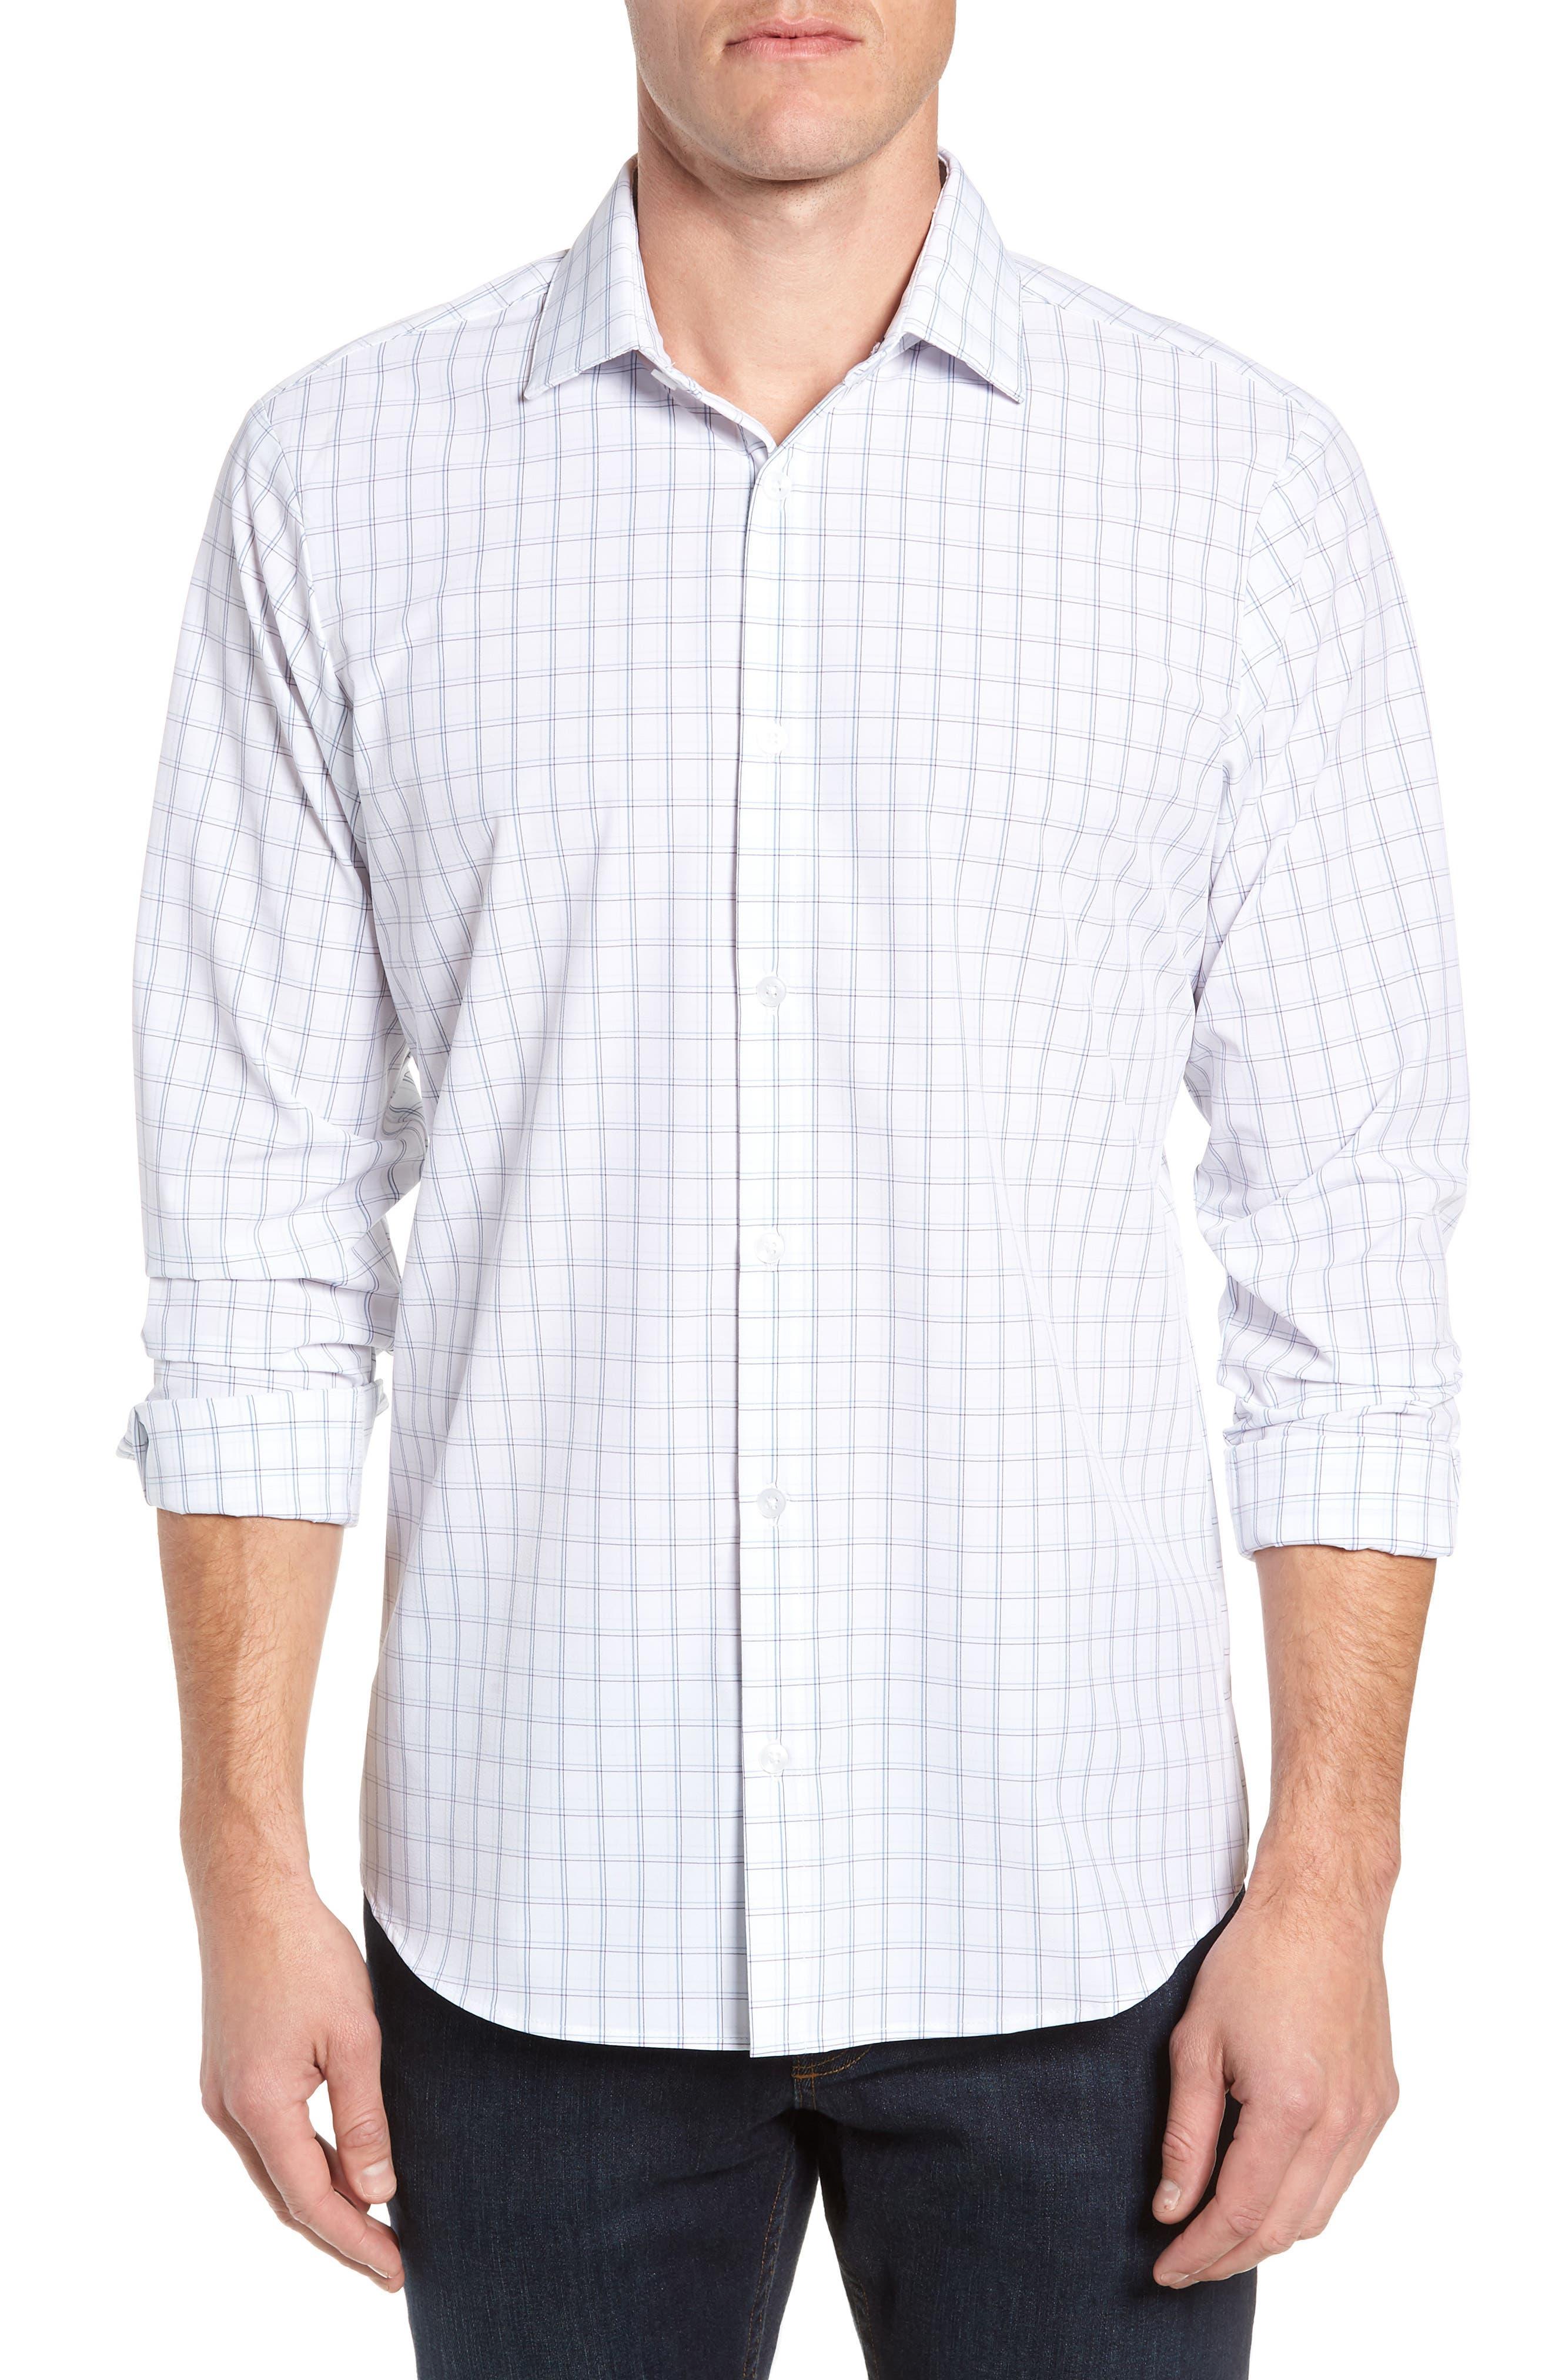 Sanders Slim Fit Check Performance Sport Shirt,                             Main thumbnail 1, color,                             WHITE